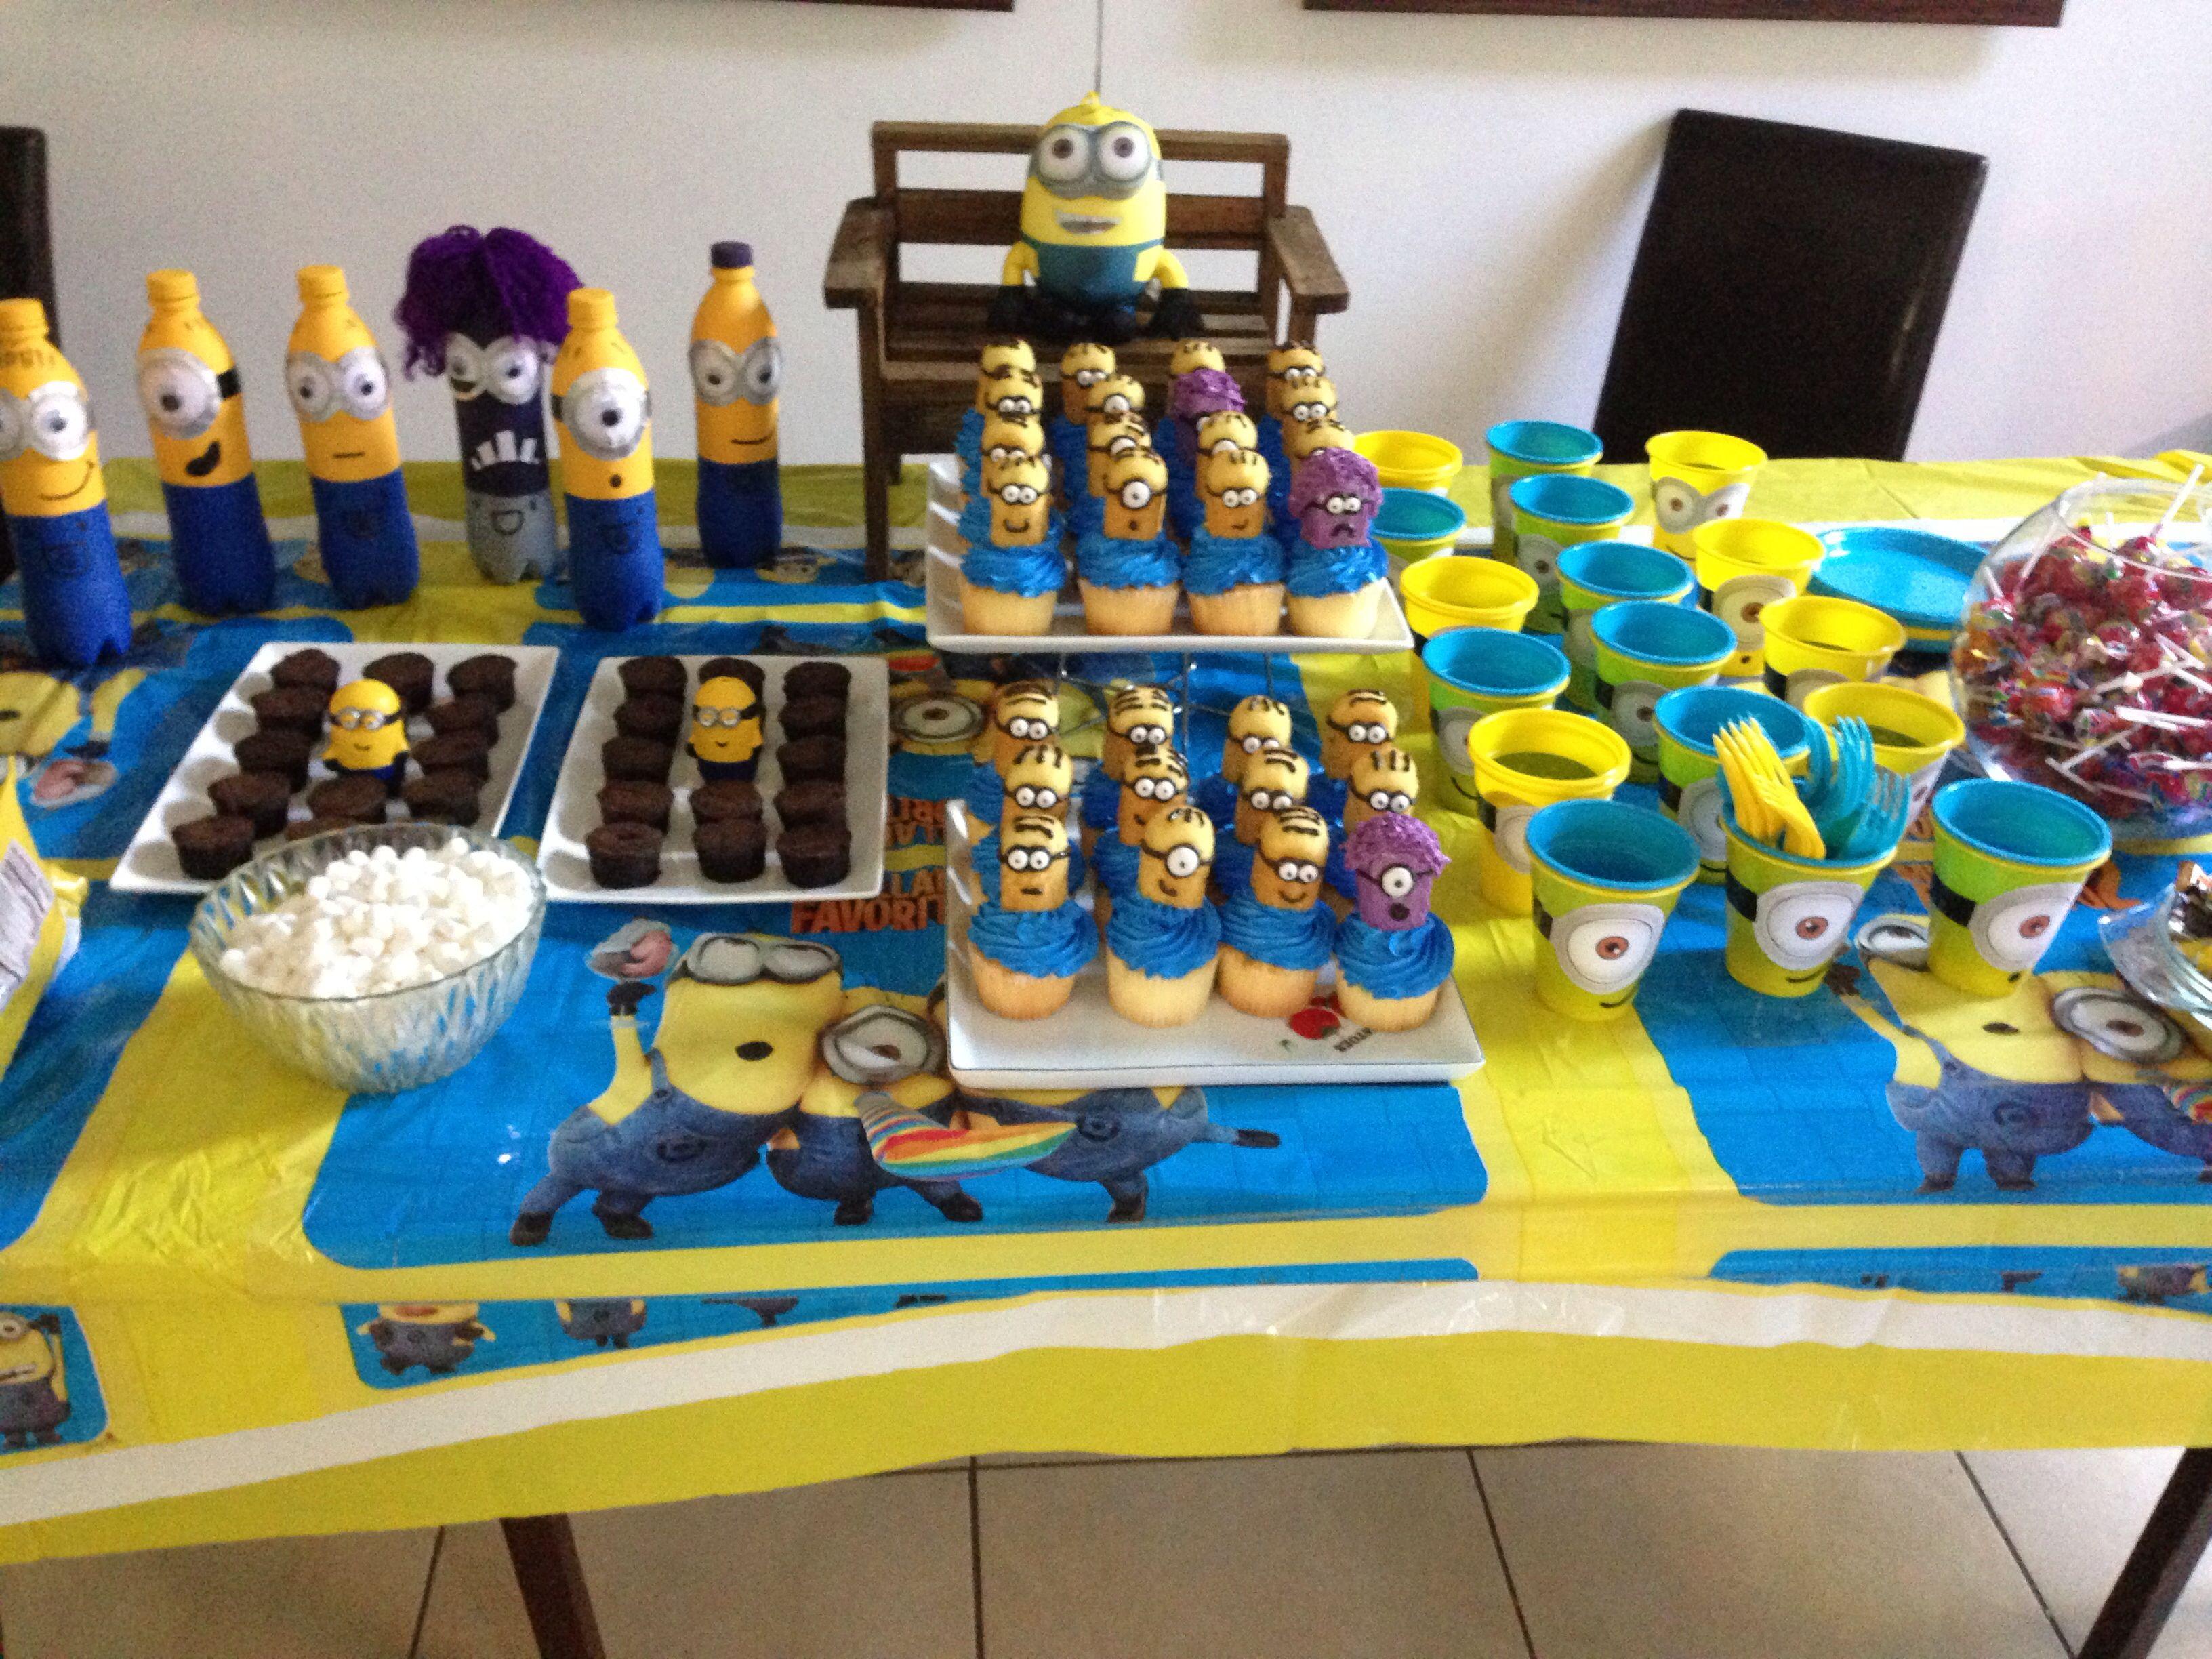 Fiesta minion con decoraci n hecha en casa minions - Decoracion hecha en casa ...